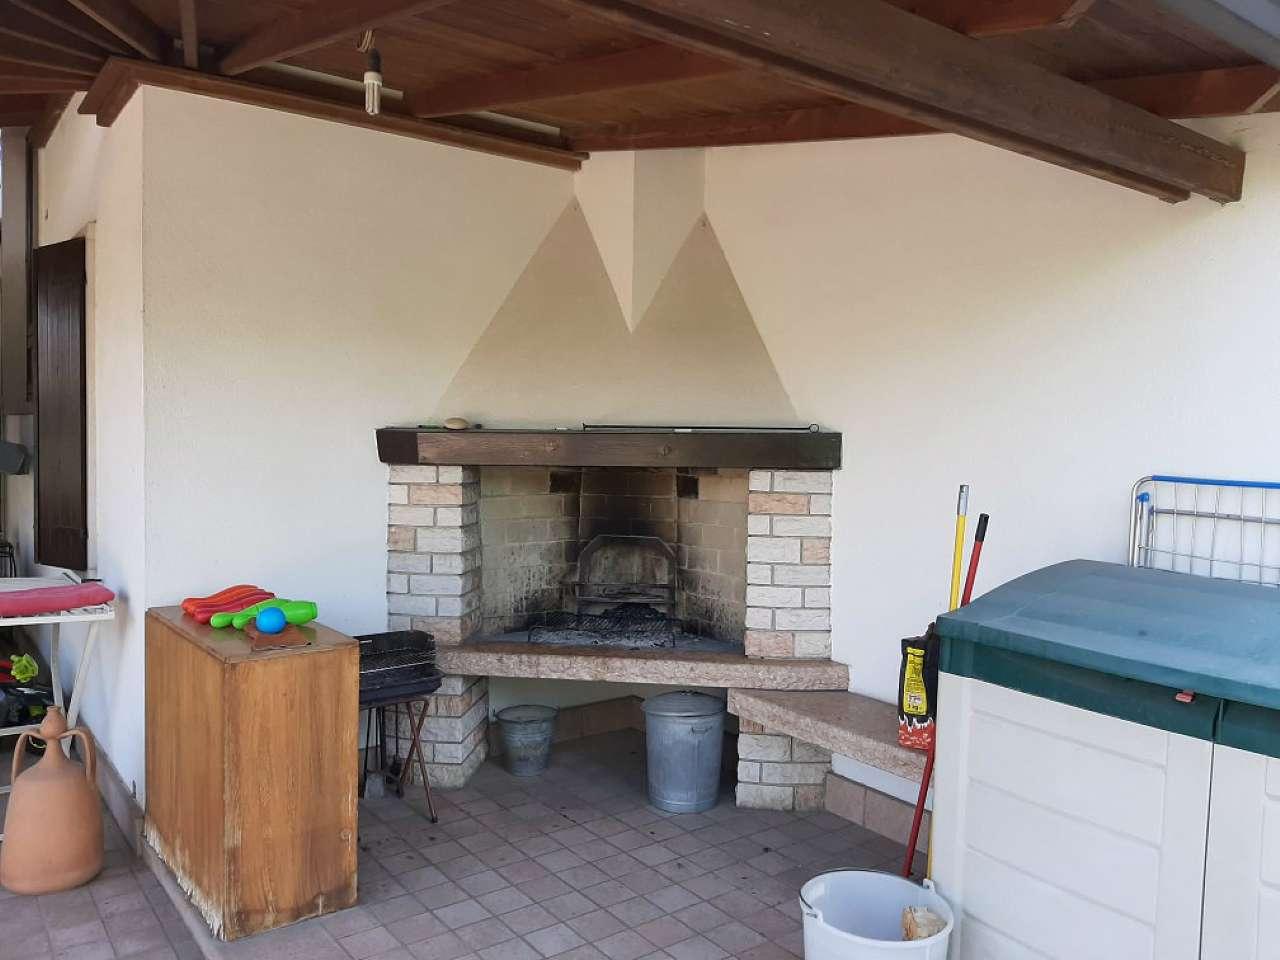 Bussolengo - Villa con giardino, foto 13